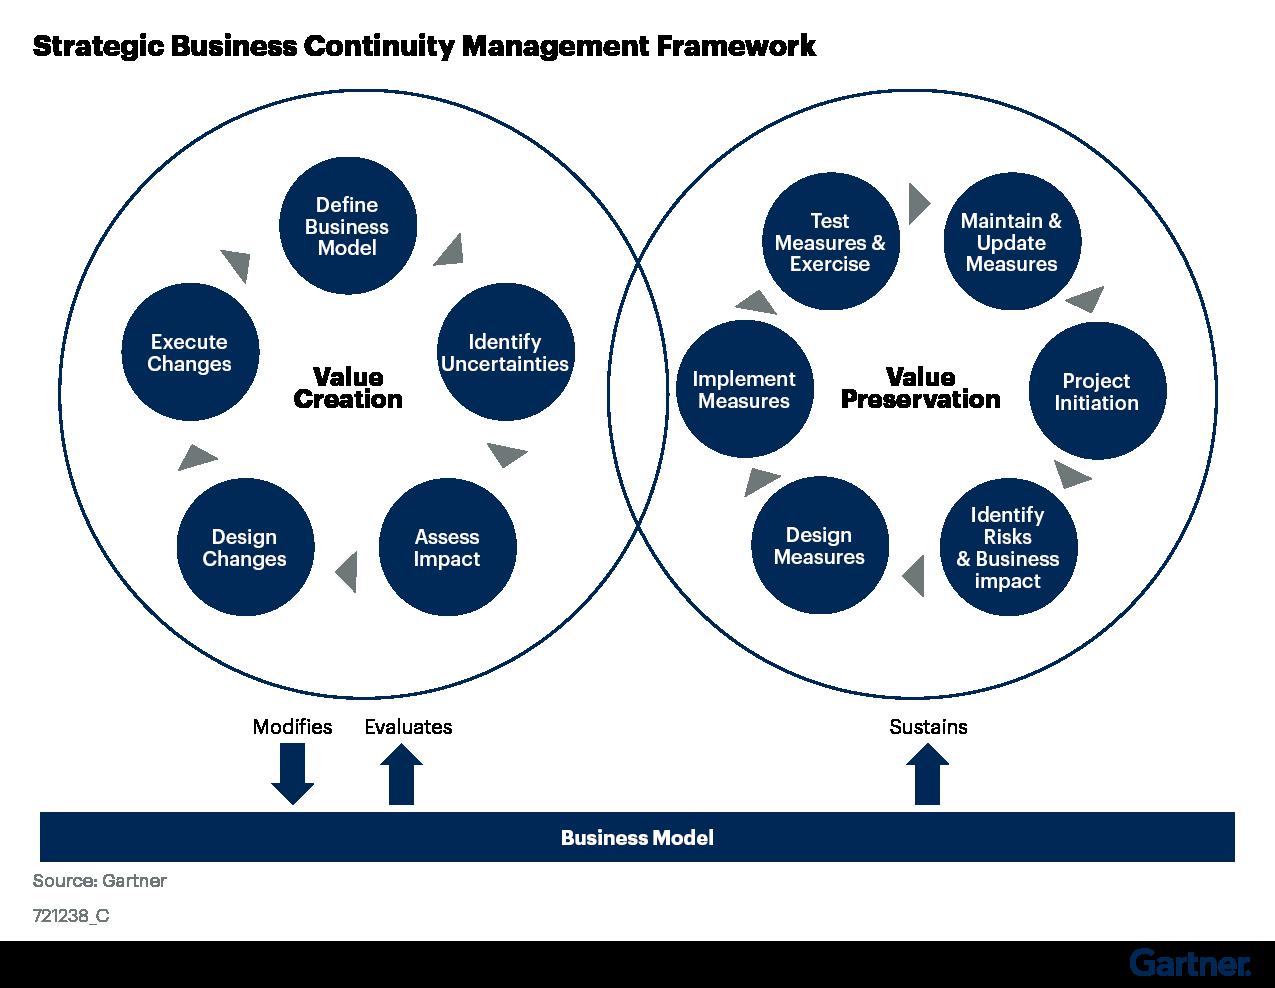 Figure 2. Strategic Business Continuity Management Framework